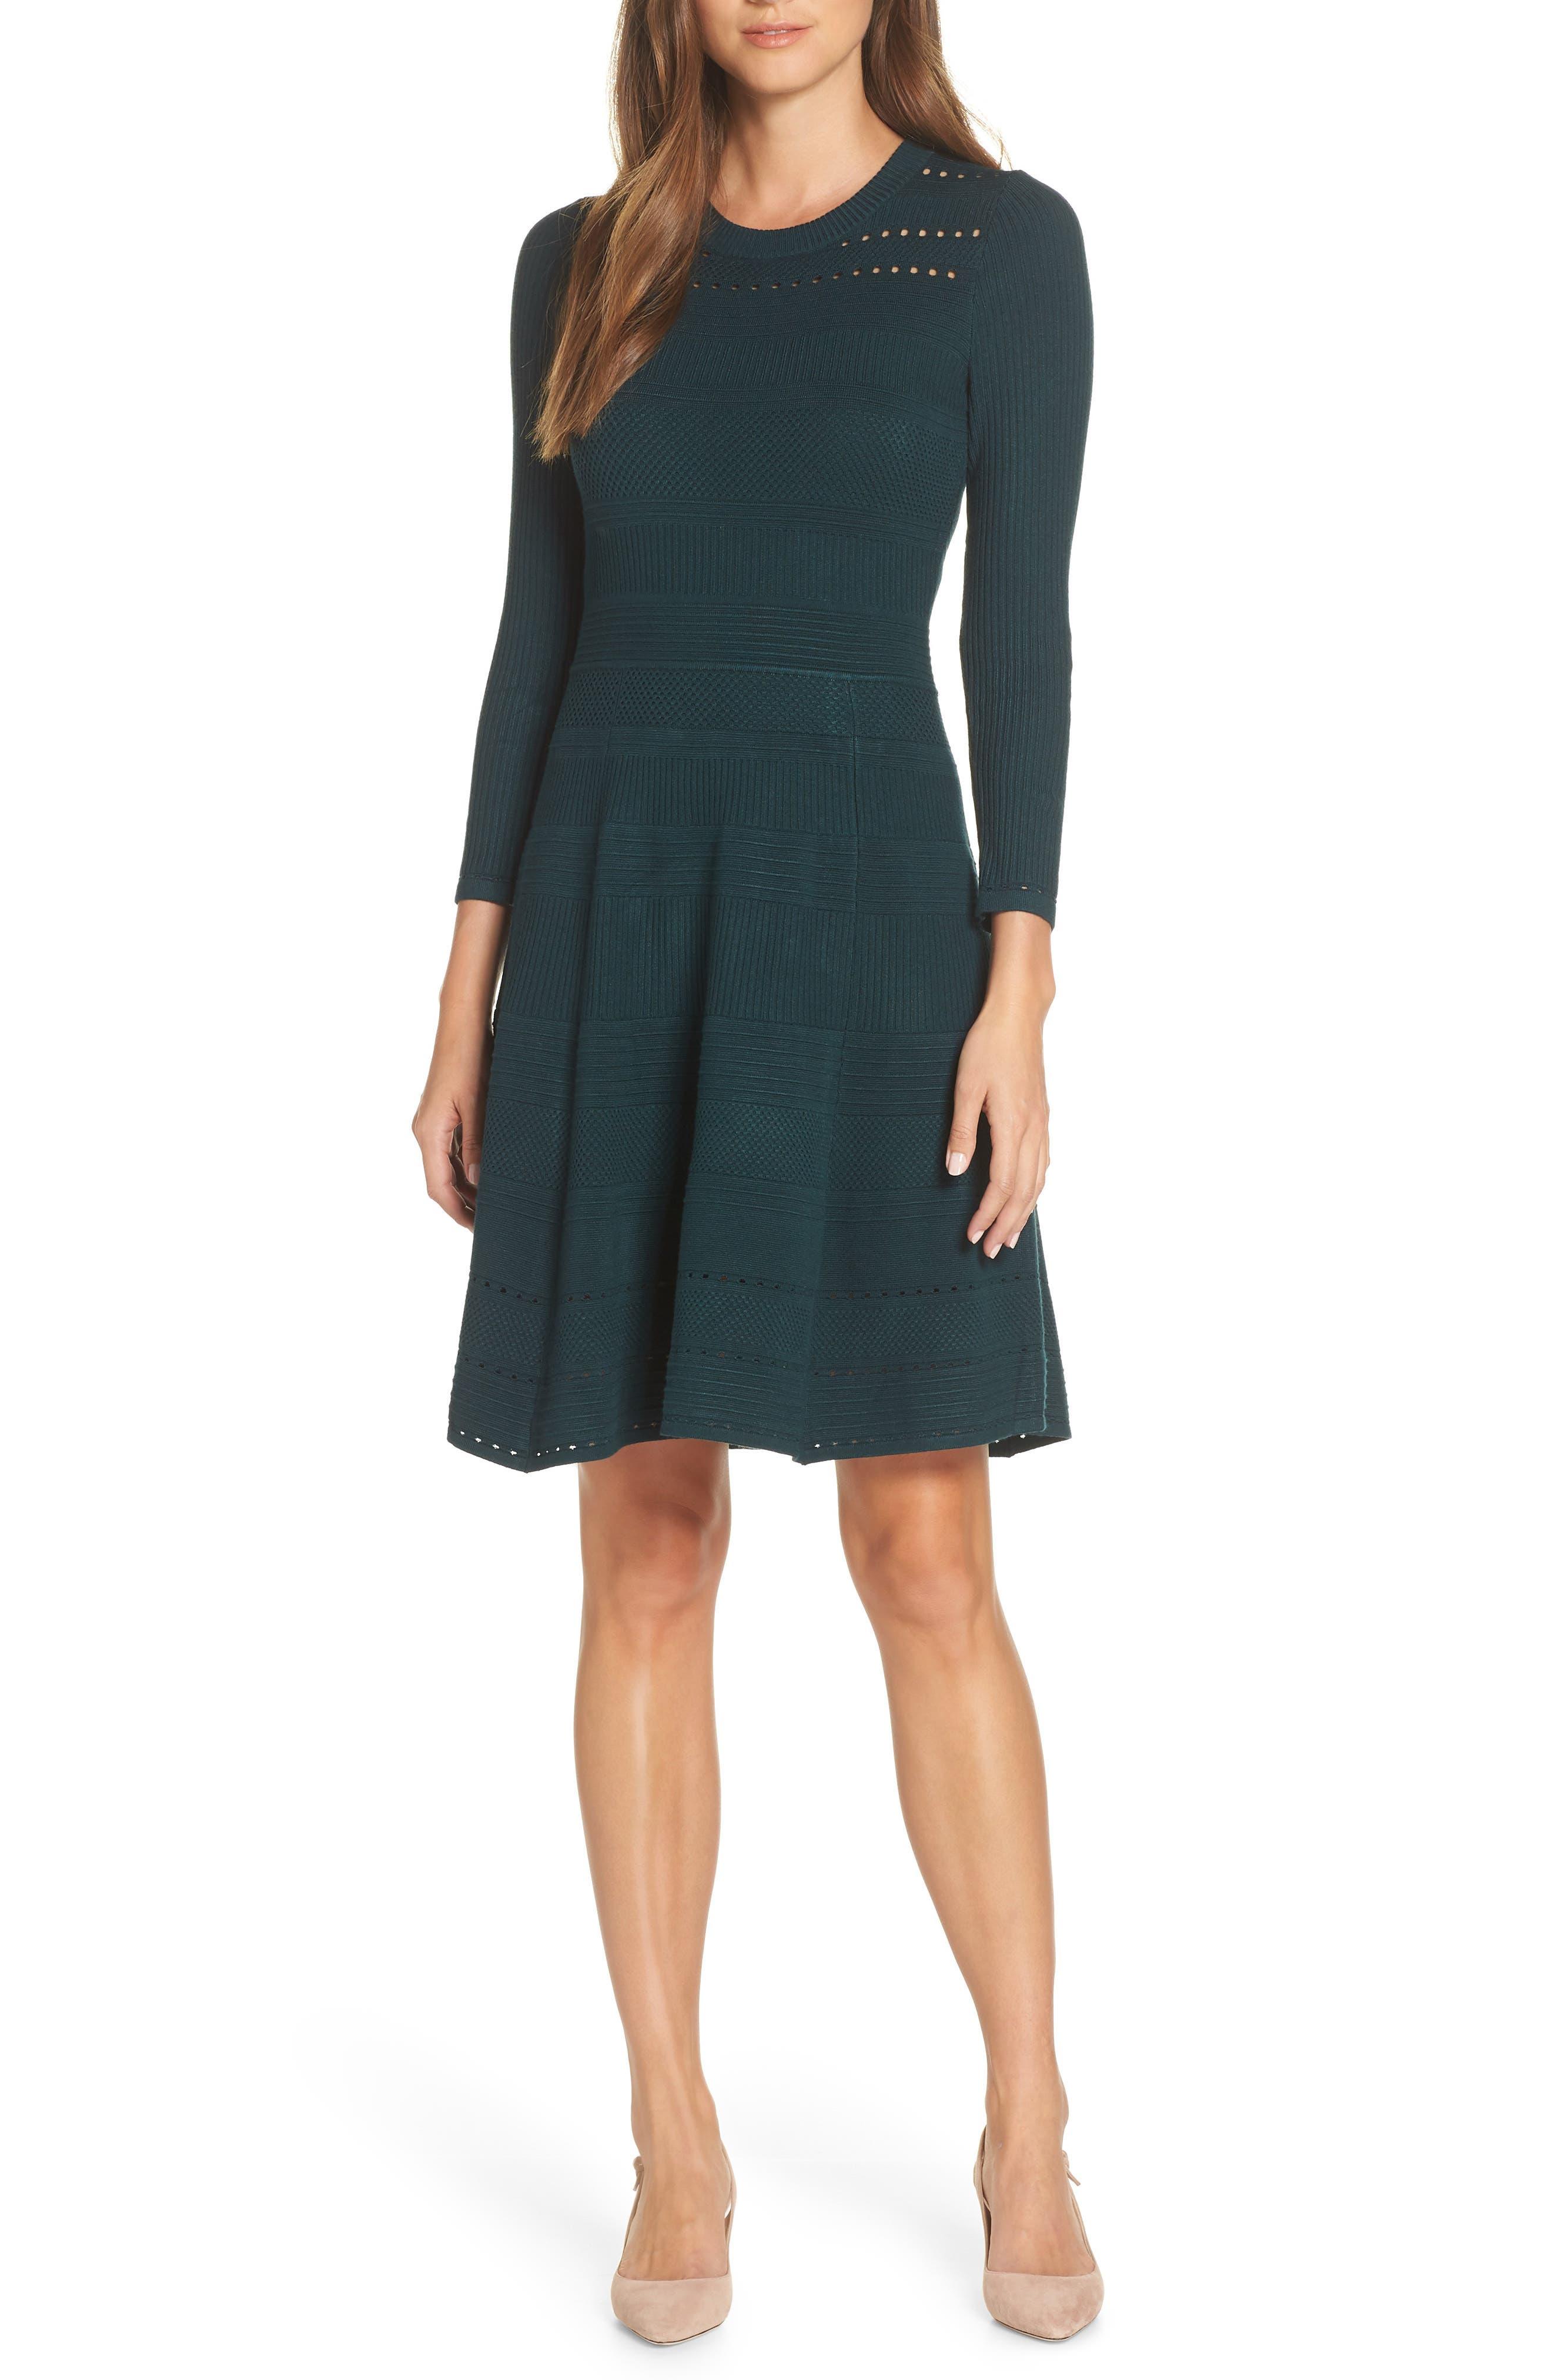 ELIZA J,                             Fit & Flare Sweater Dress,                             Main thumbnail 1, color,                             SPRUCE